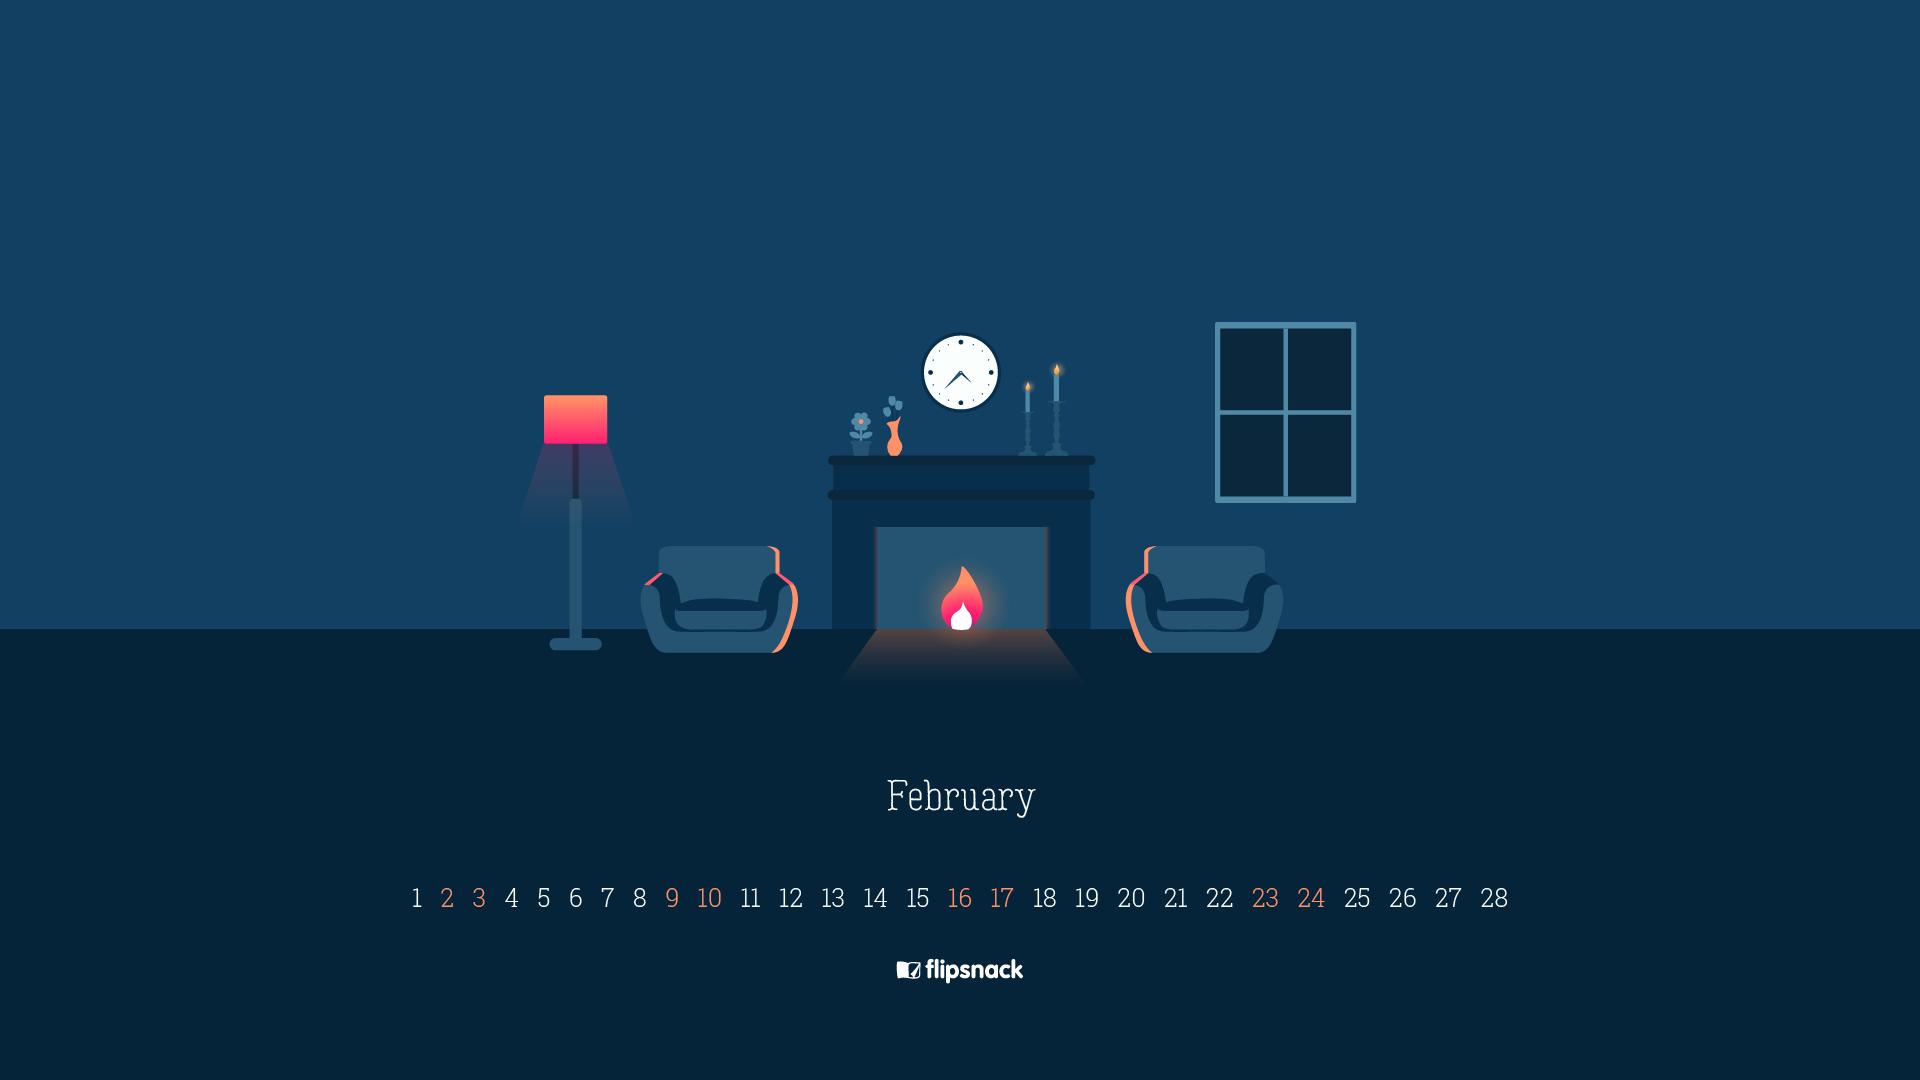 free february 2019 wallpaper calendars